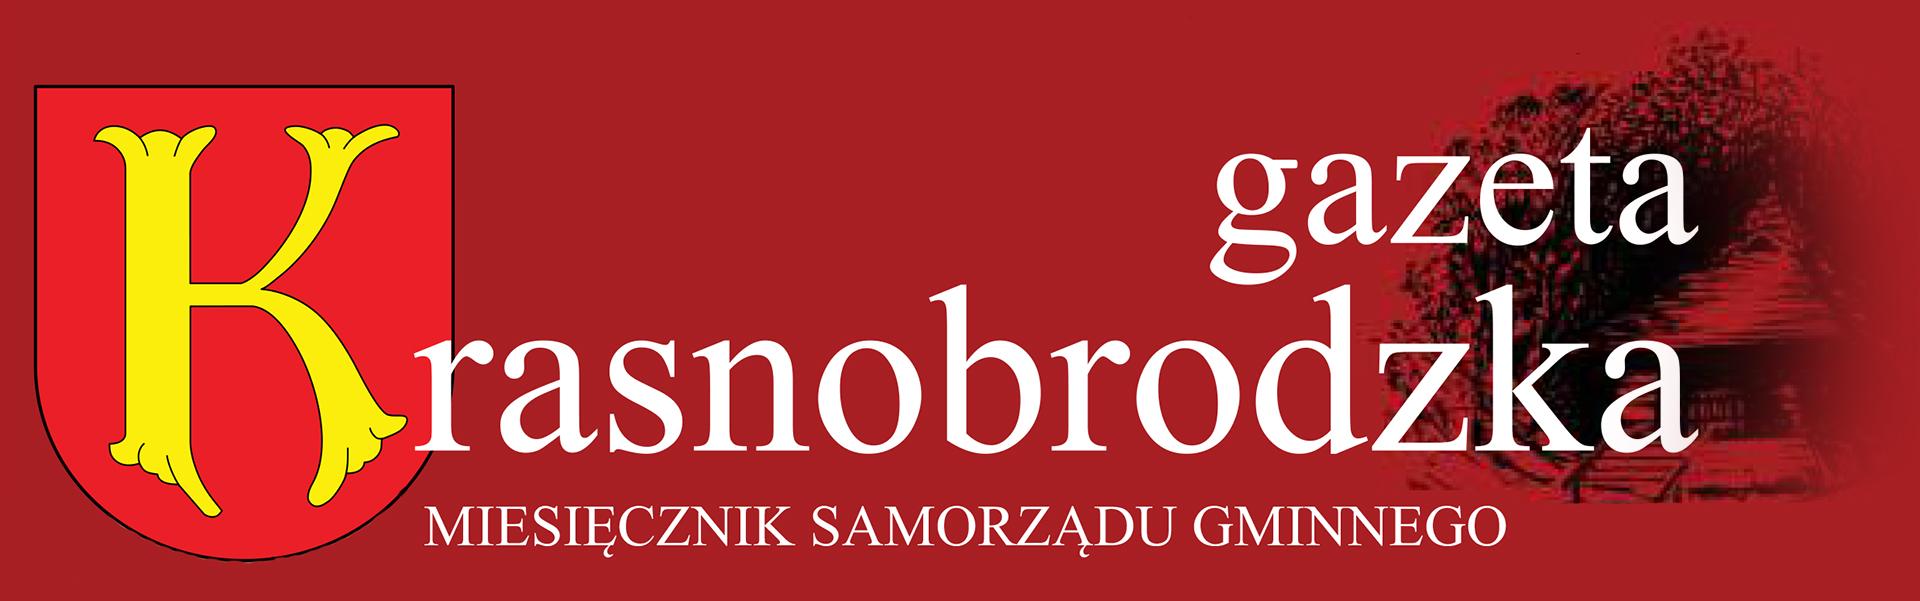 Gazeta Krasnobrodzka